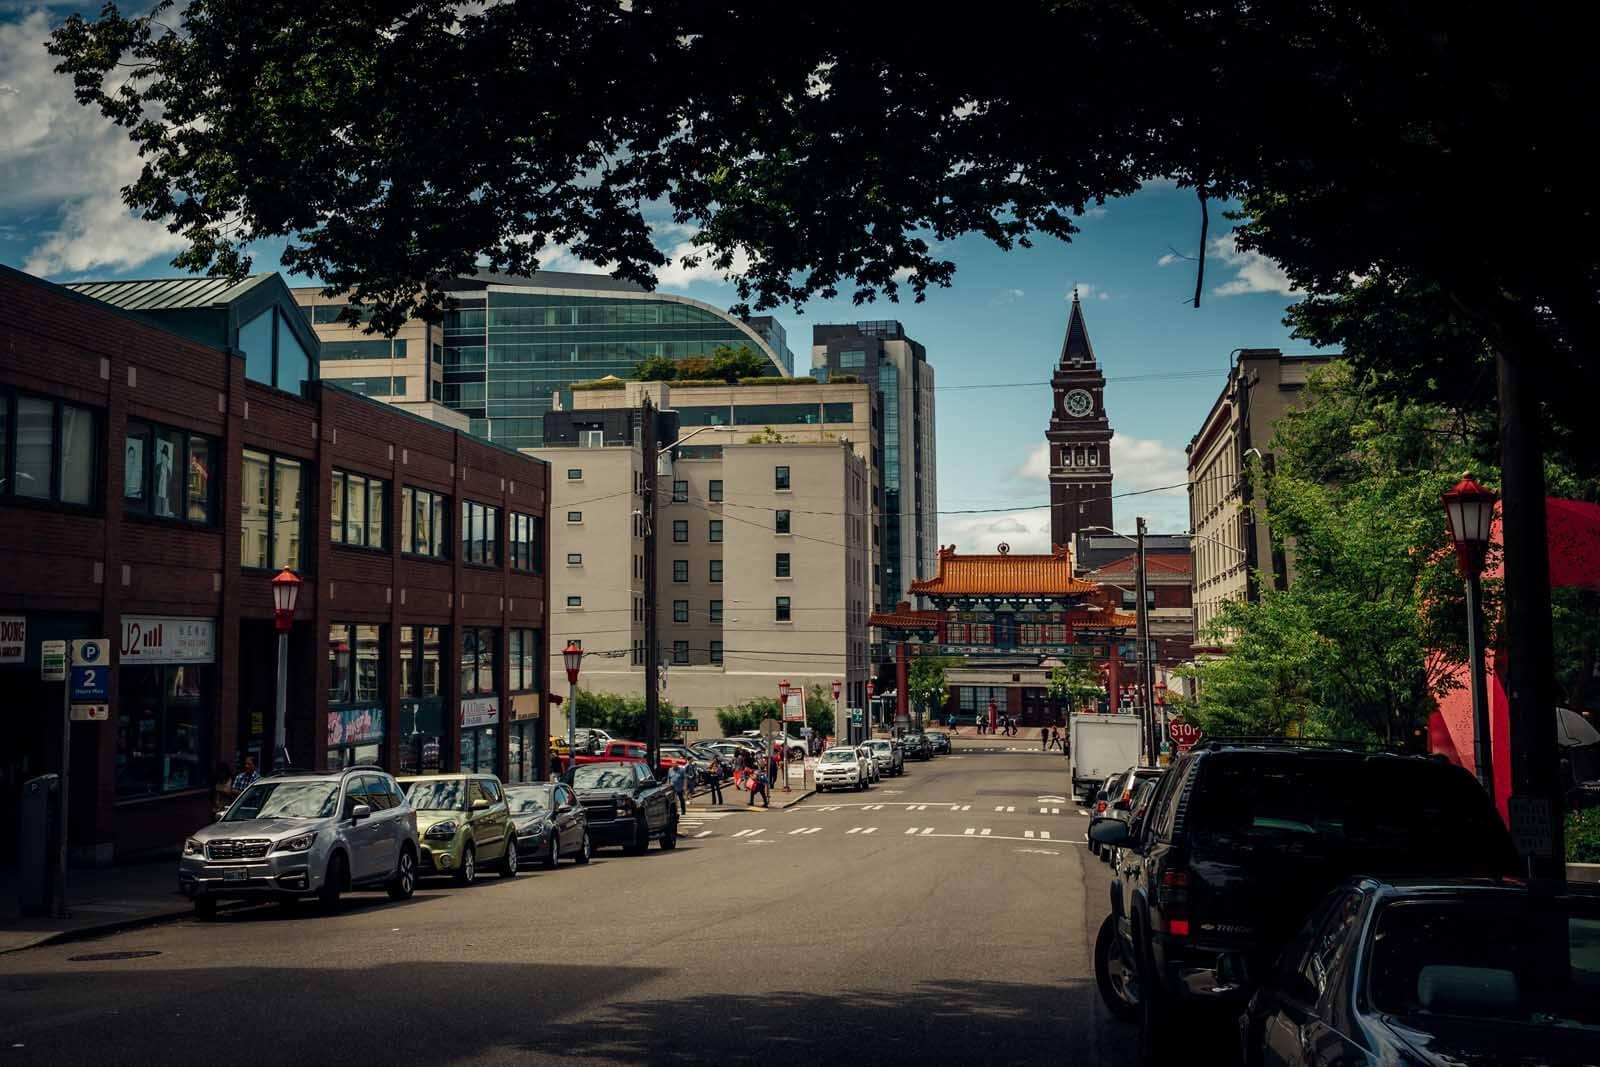 International District and Chinatown neighborhood of Seattle Washington